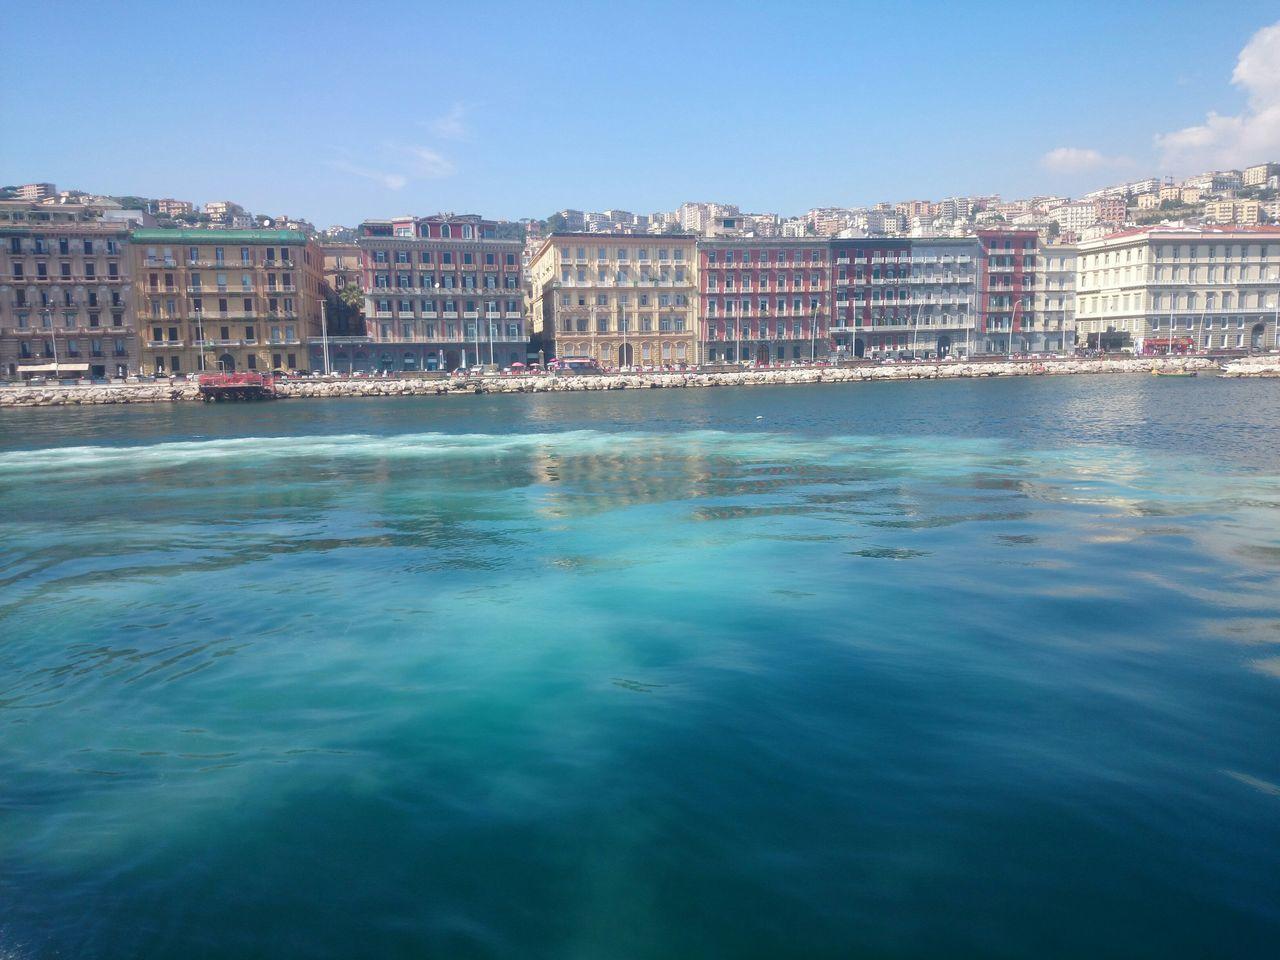 THE HARBOR OF NAPLES Napoli Naples Blue Sea Sea_collection City Harbour View Harborside Inner Harbor